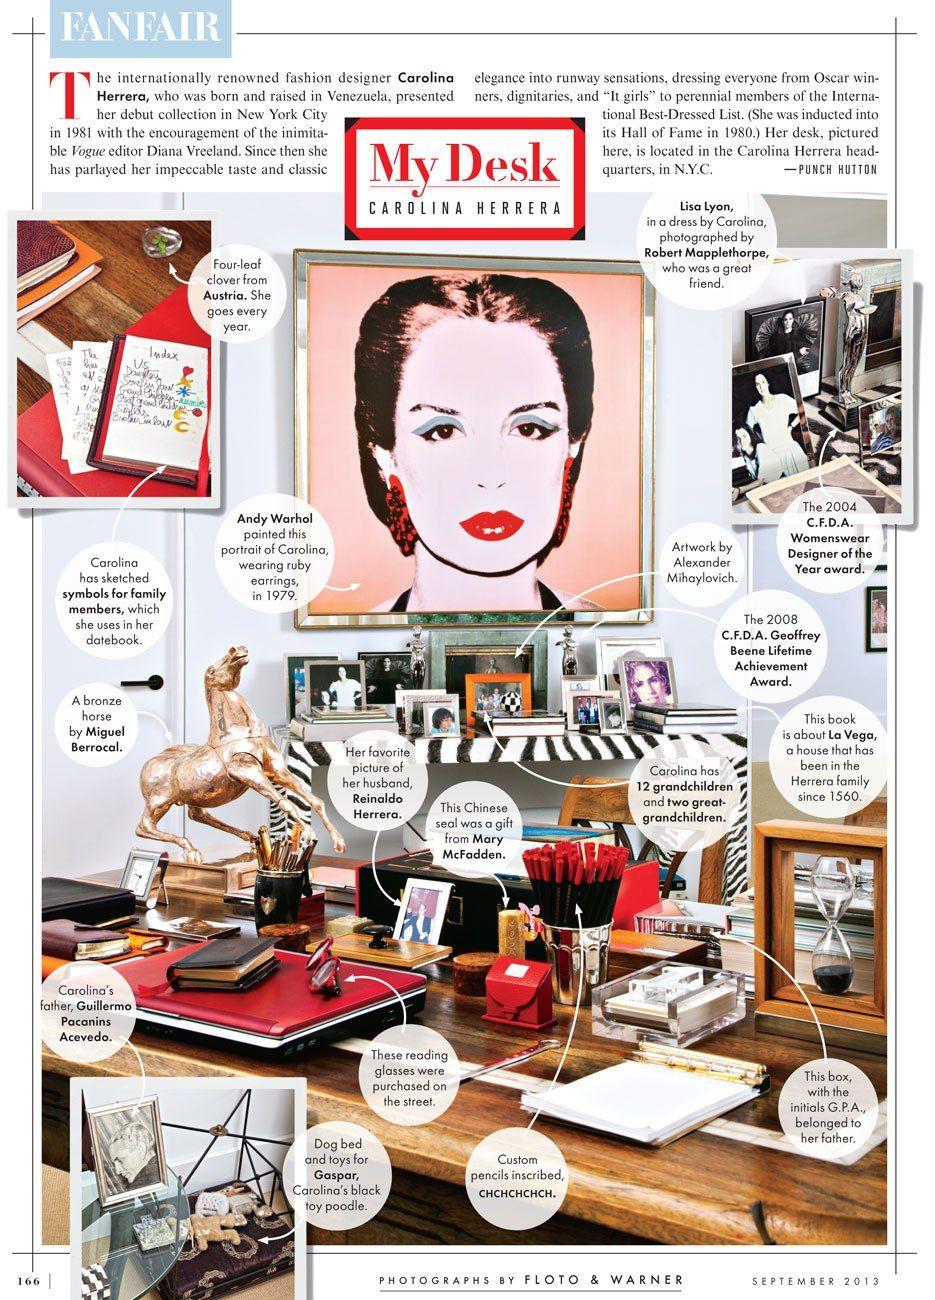 The desk of fashion designer Carolina Herrera.